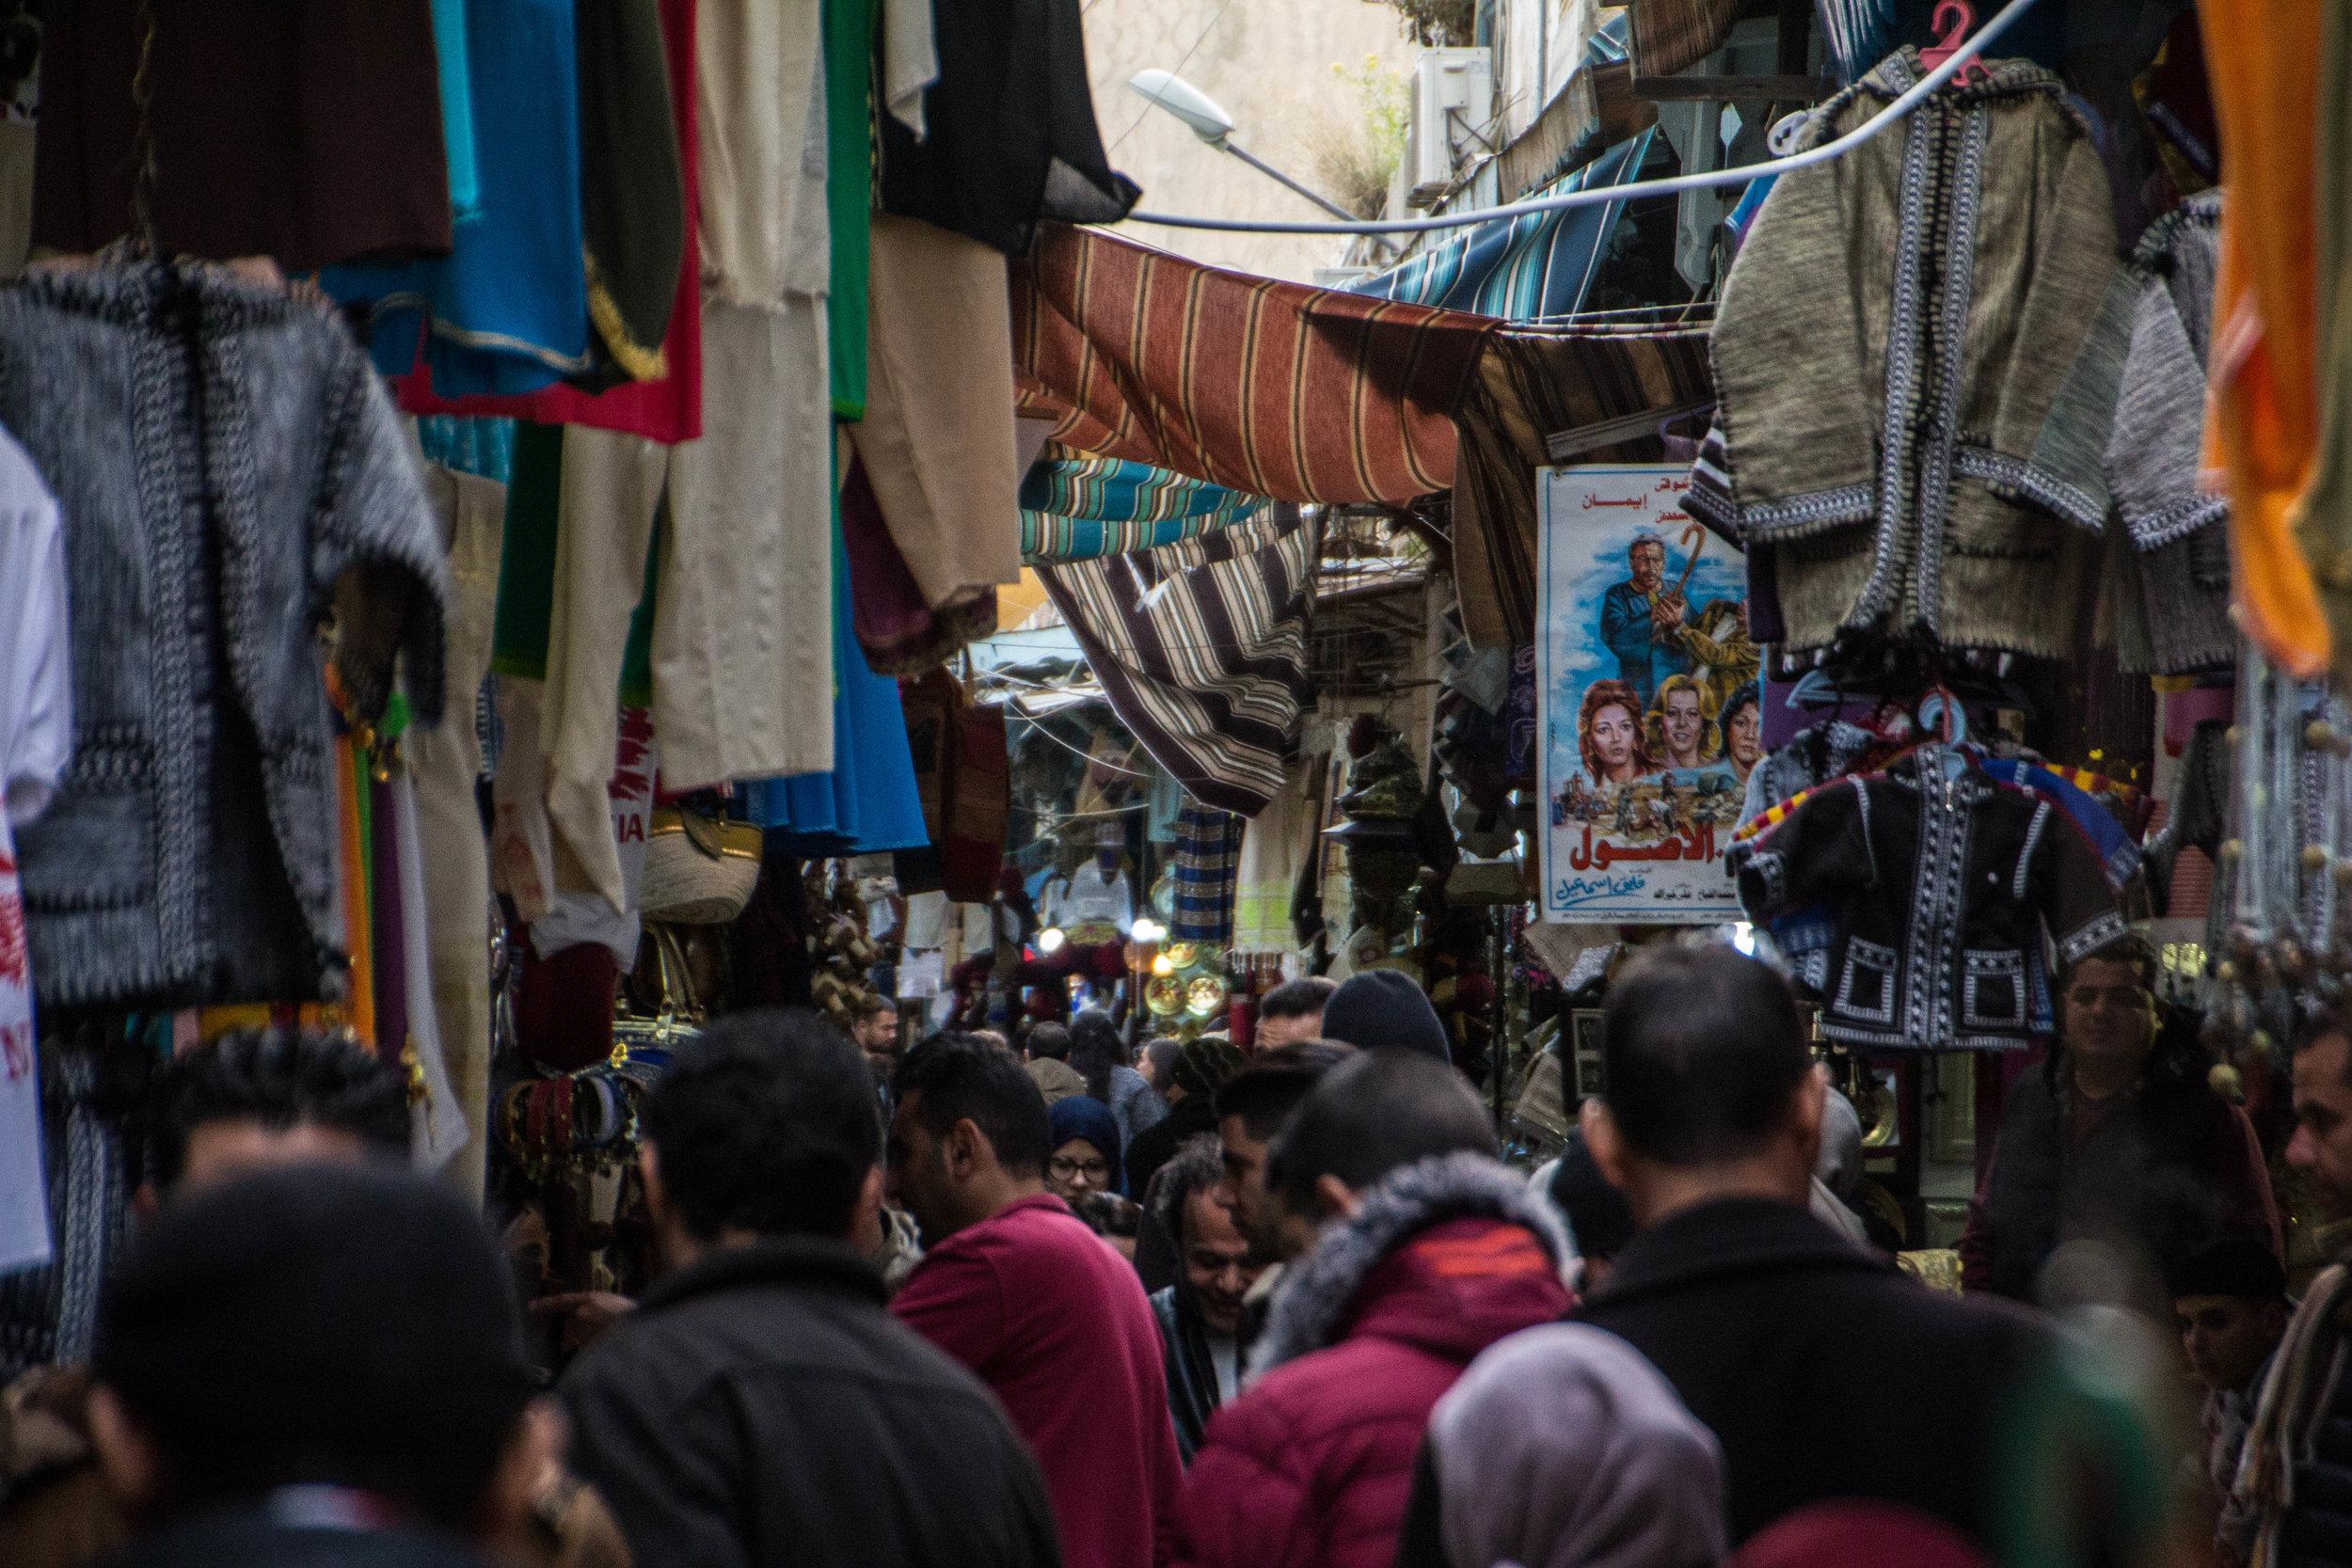 medina-photography-tunis-tunisia-3.jpg